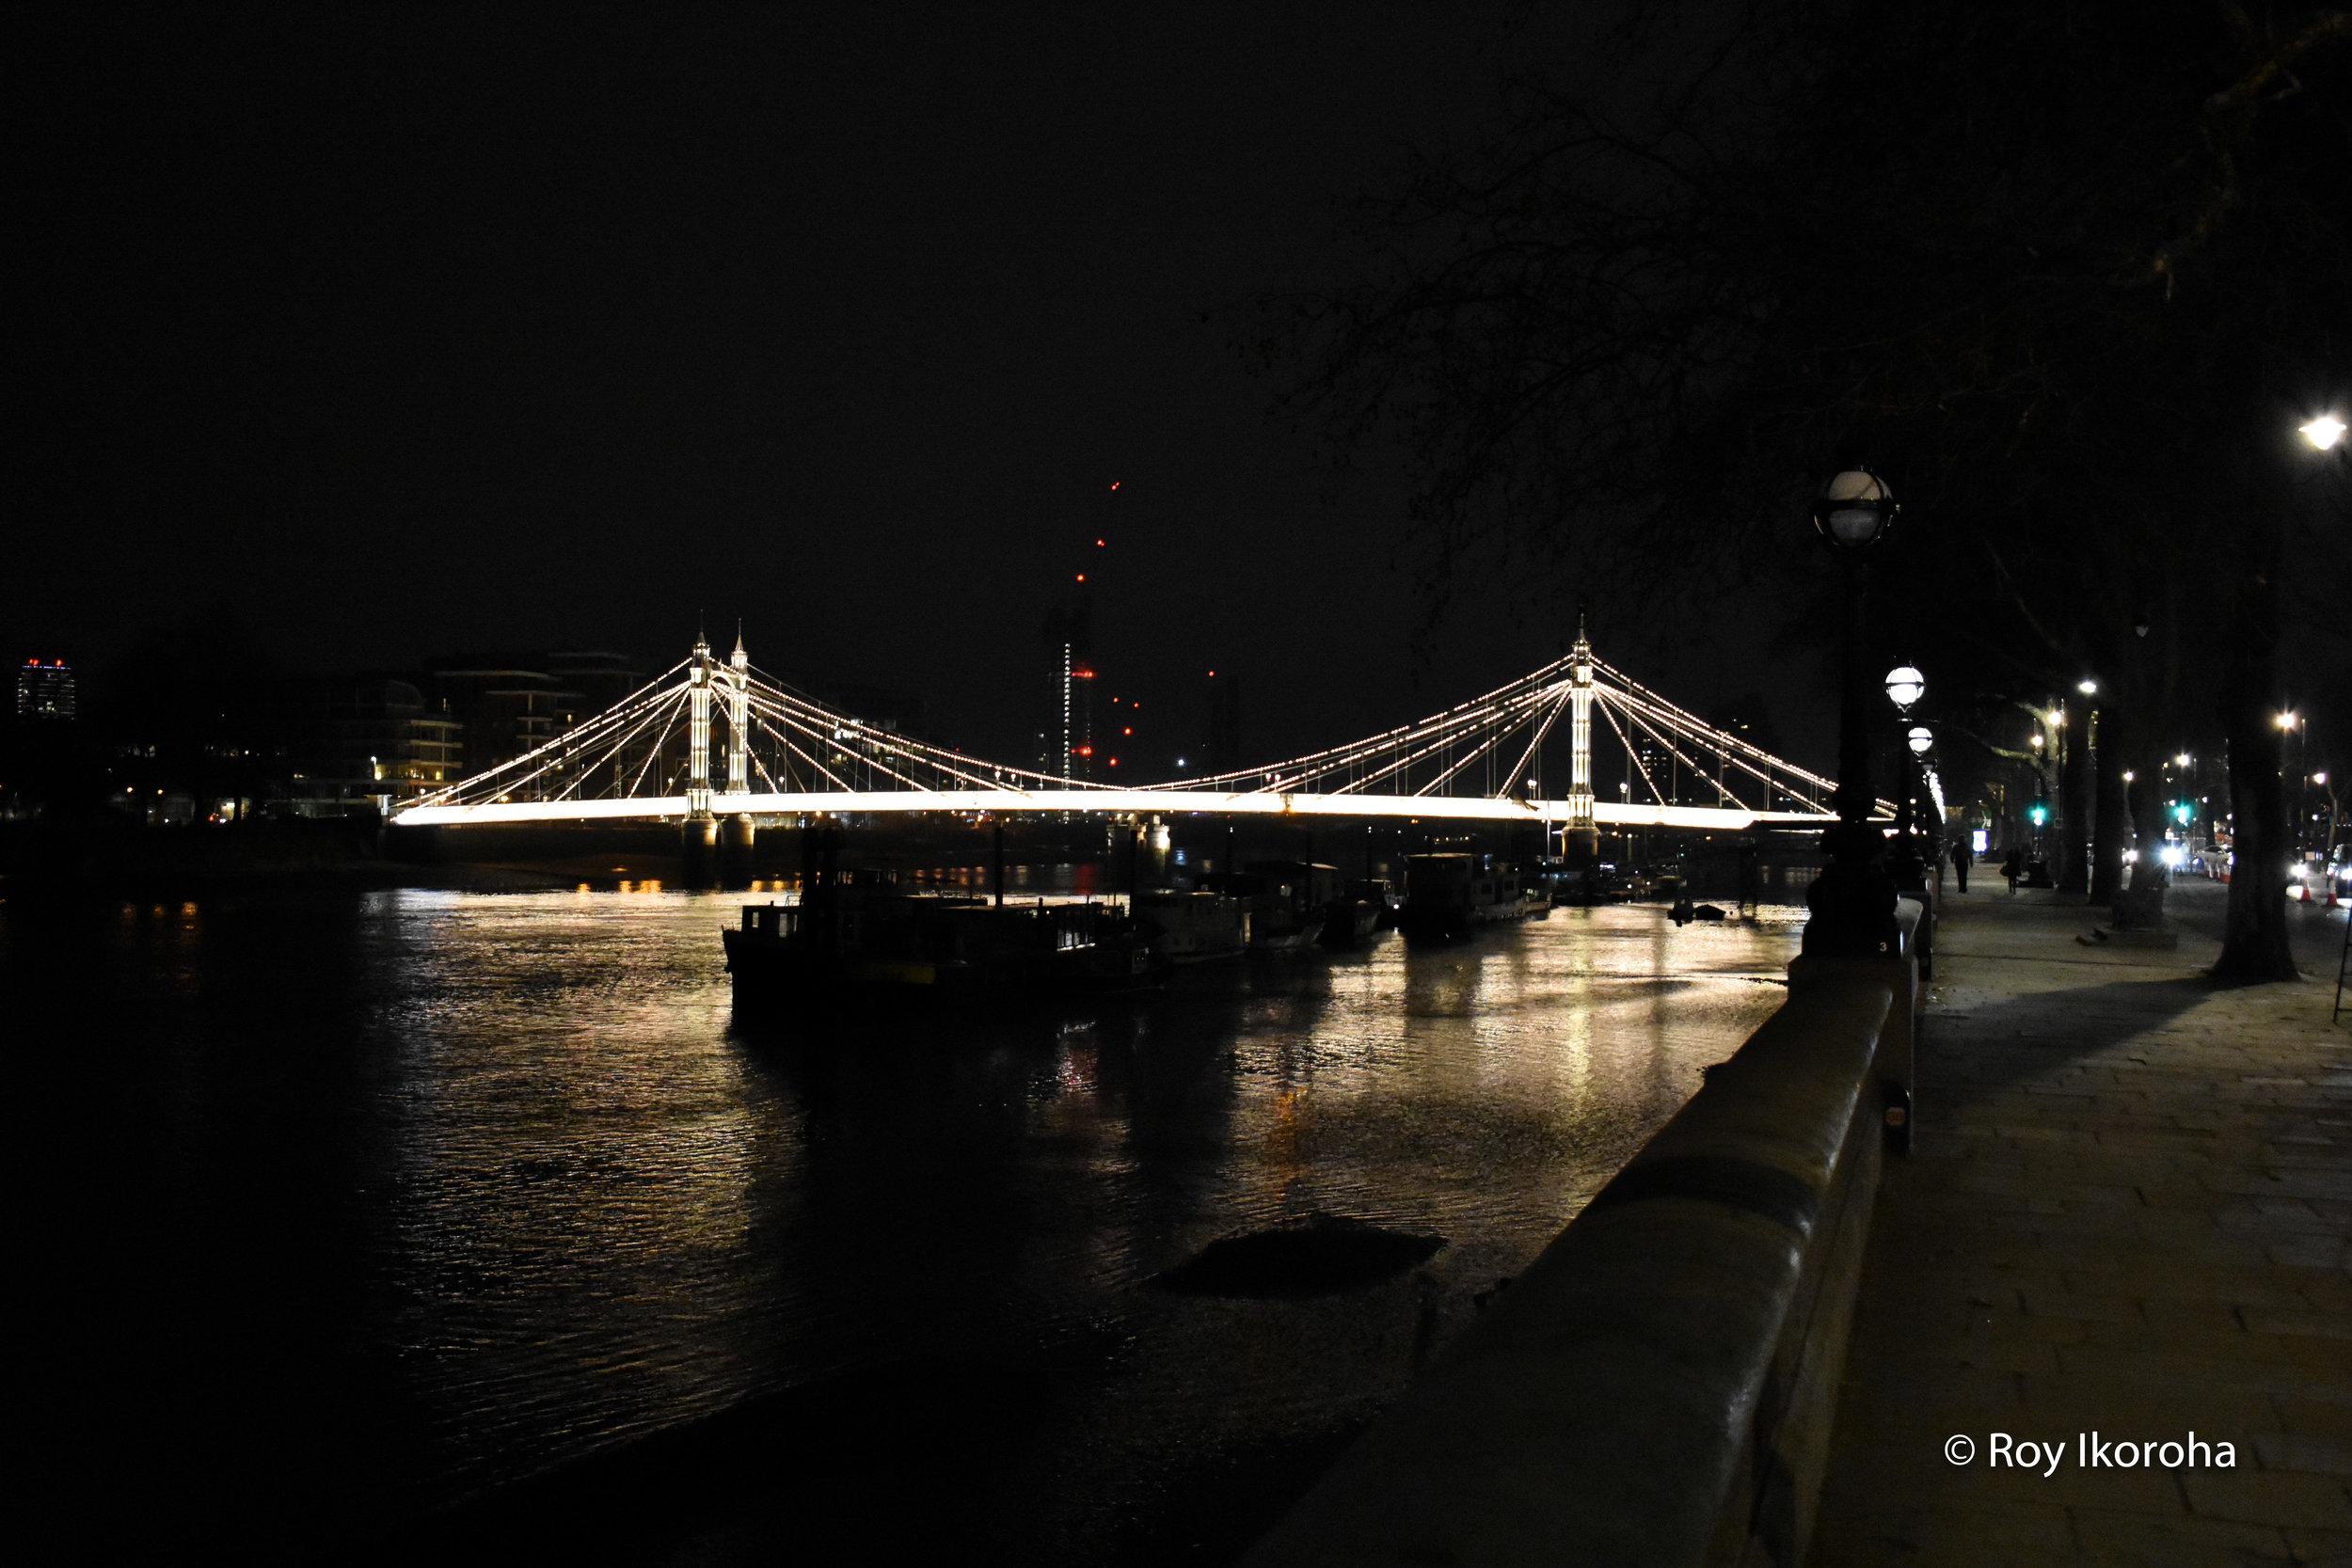 Albert Bridge, Chelsea, London